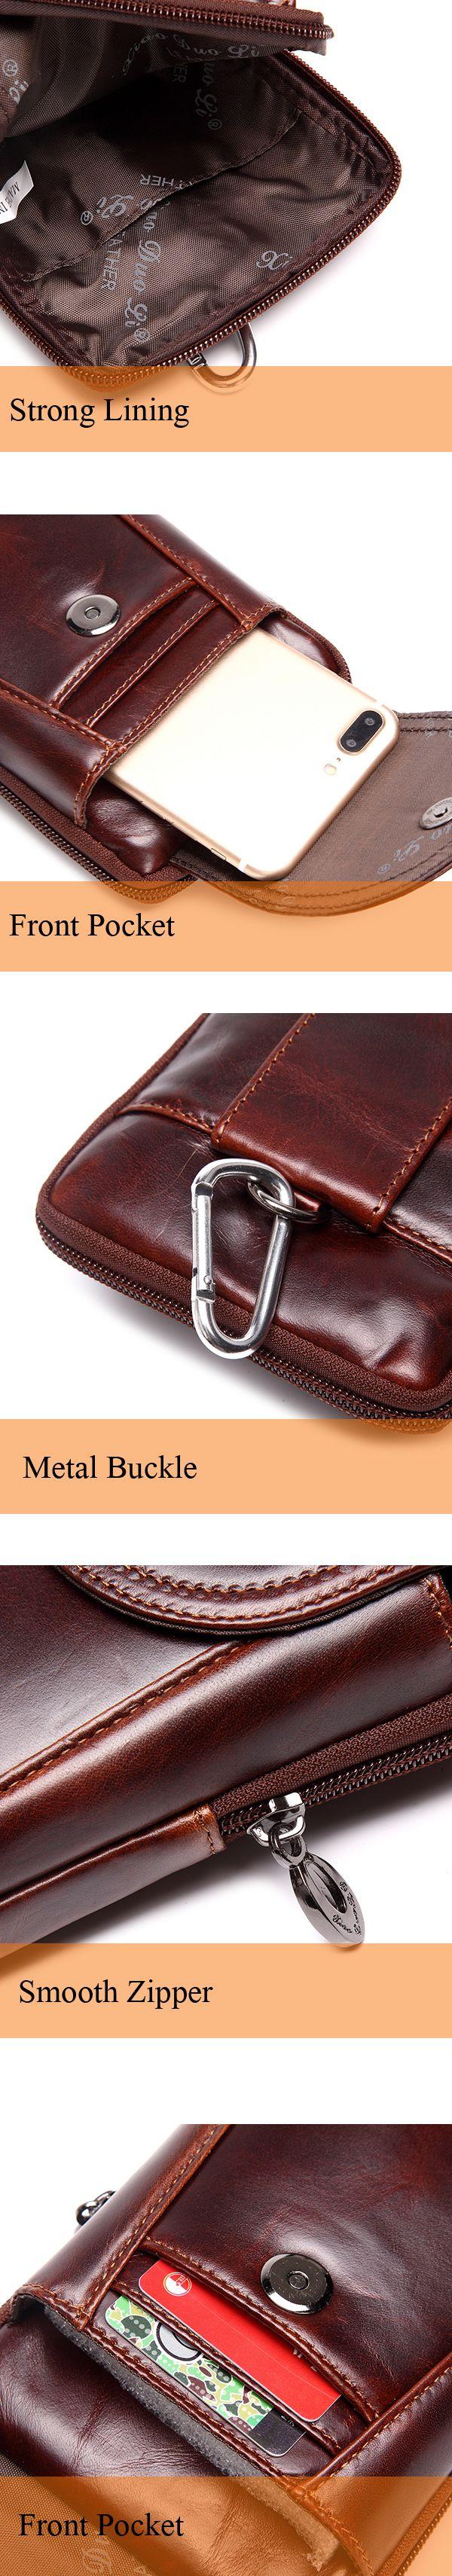 Men Genuine Leather Waist Bag Business Crossbody Bag Cellphone Bag